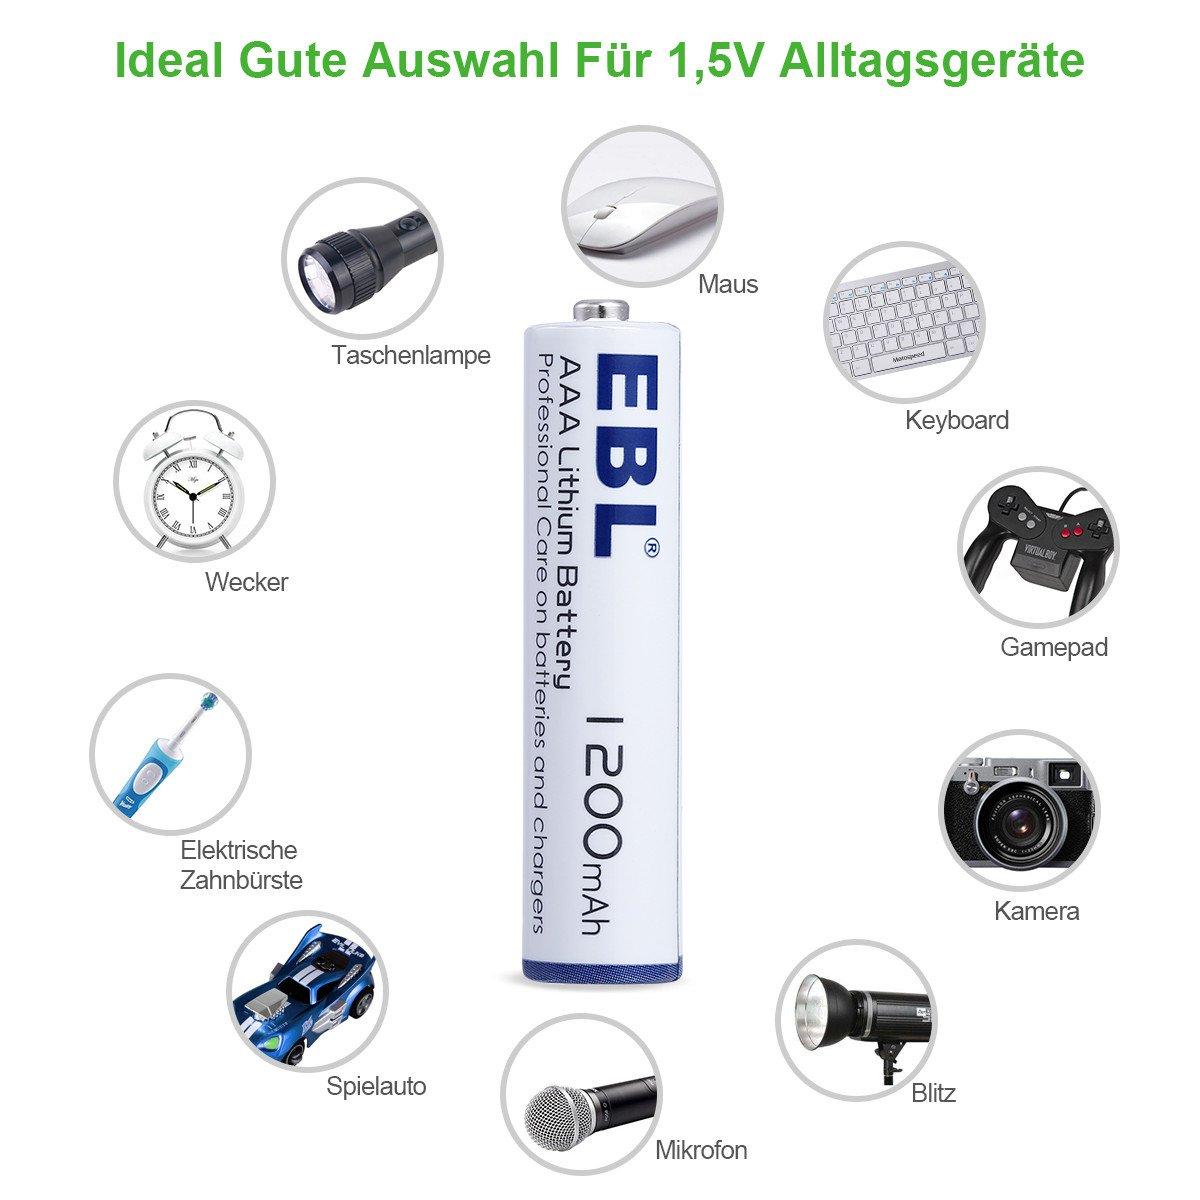 EBL AAA Lithium Batterie 1.5V 1200mAh sofort einsatzbereit 16 Stück